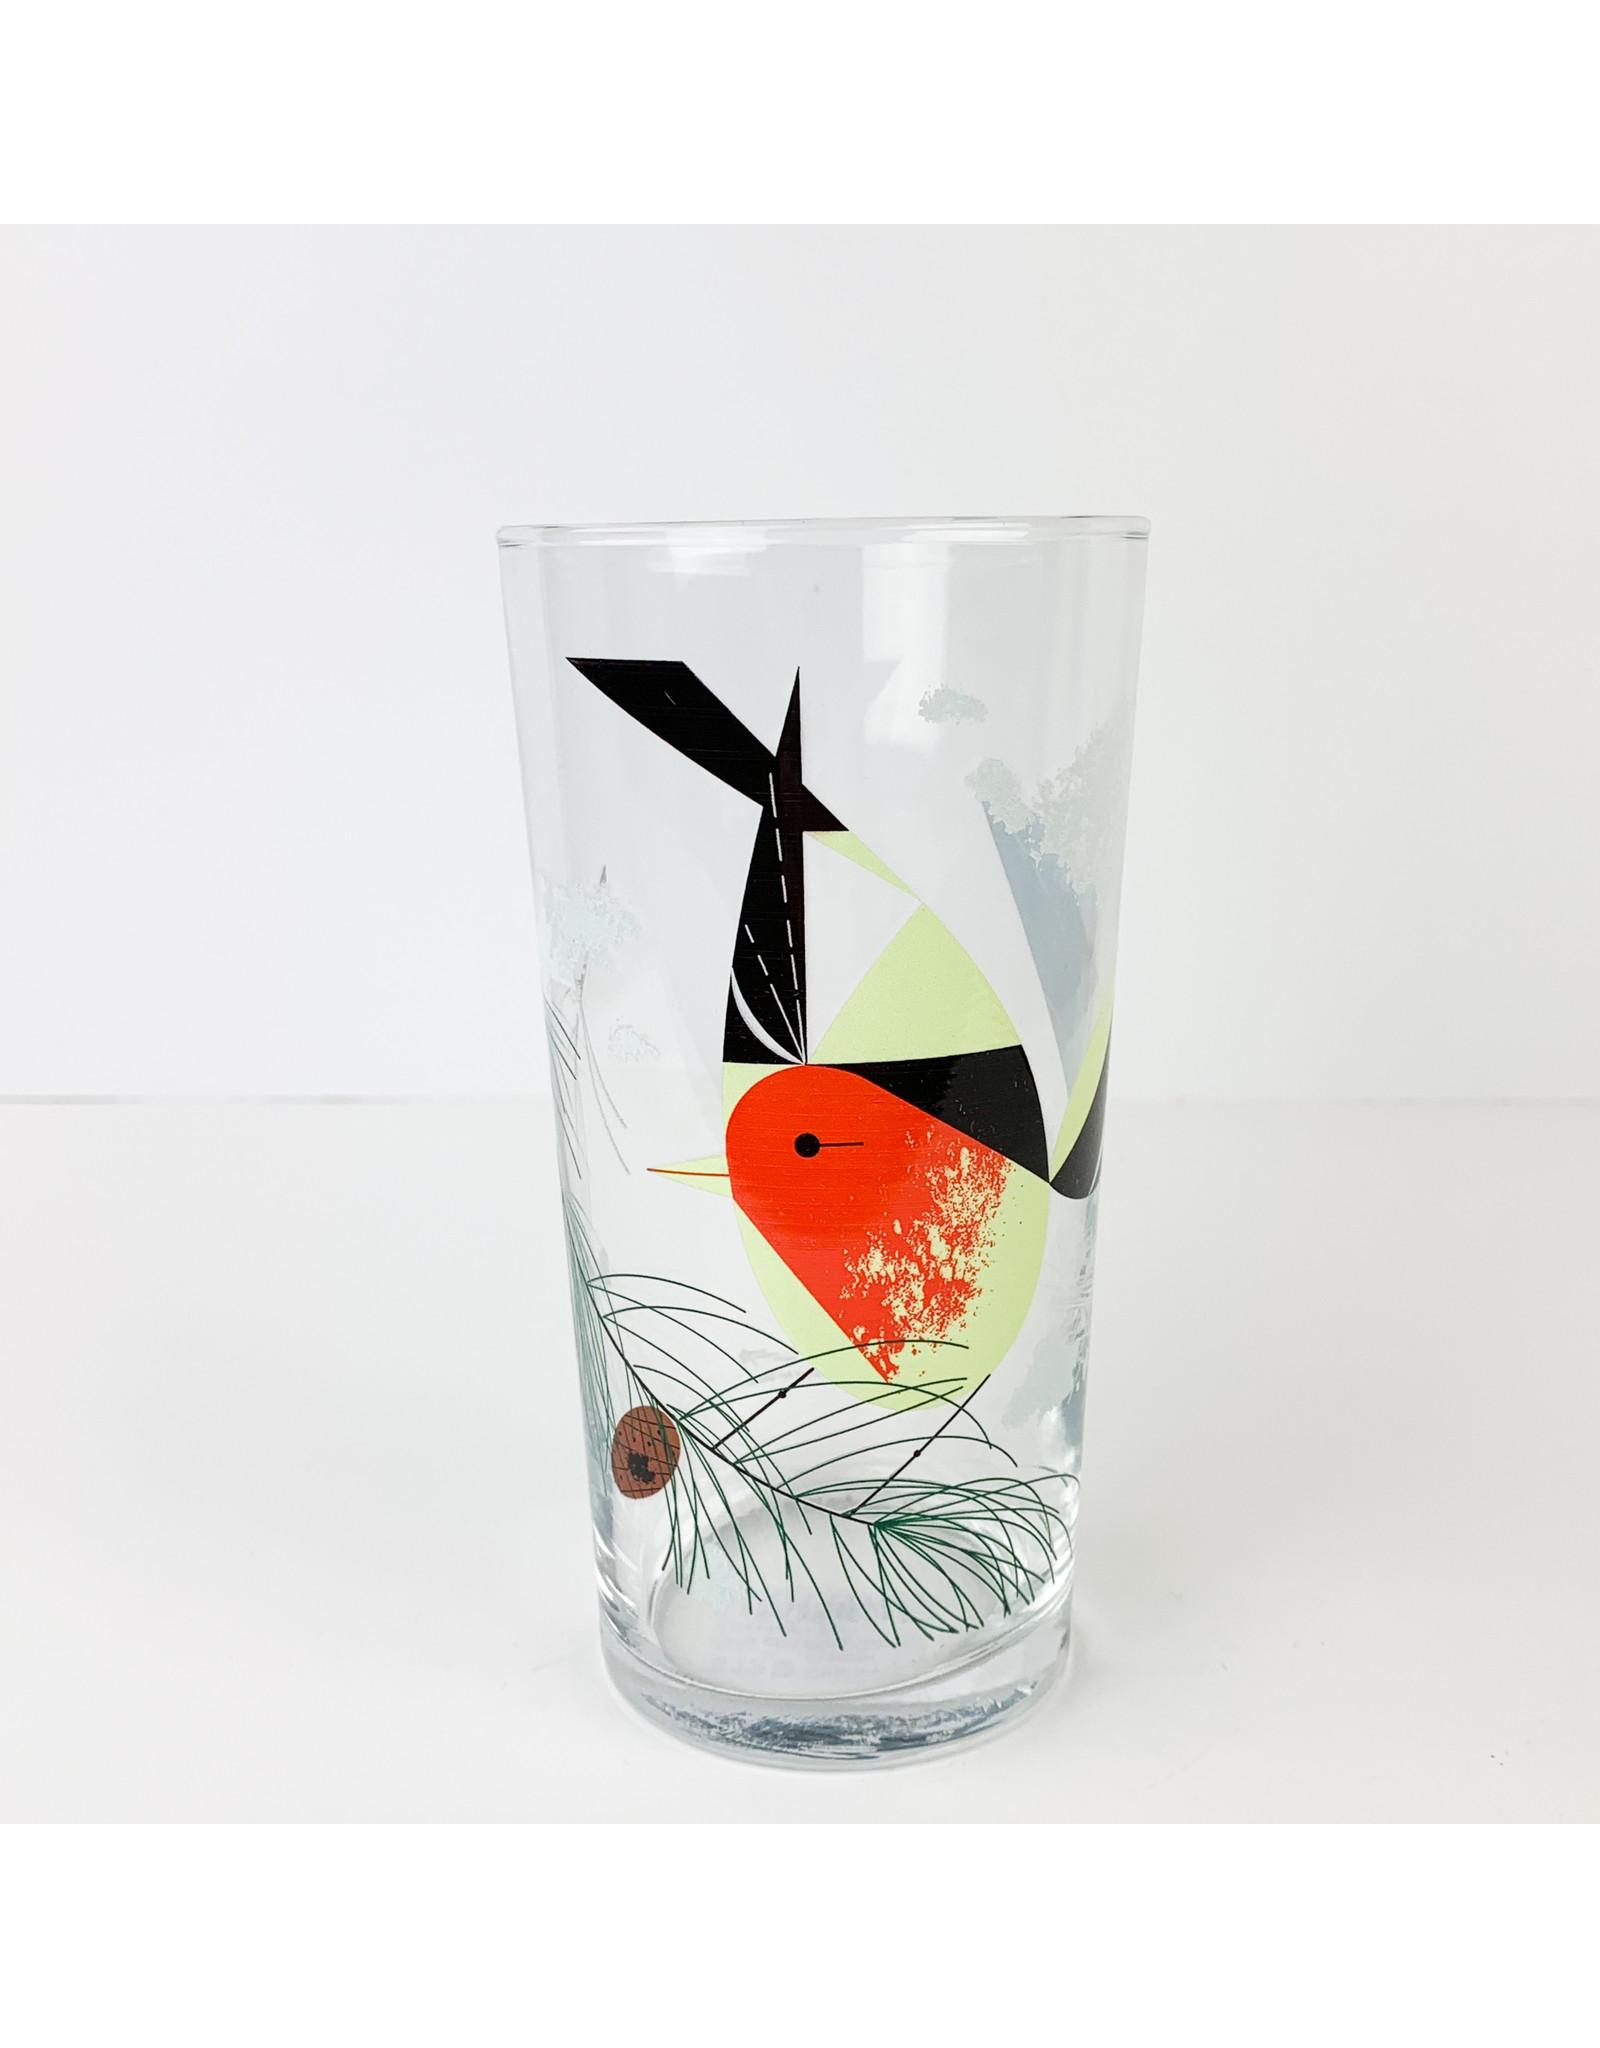 Charley Harper Art Studio Charley Harper Bird and Pine Cone Glasses